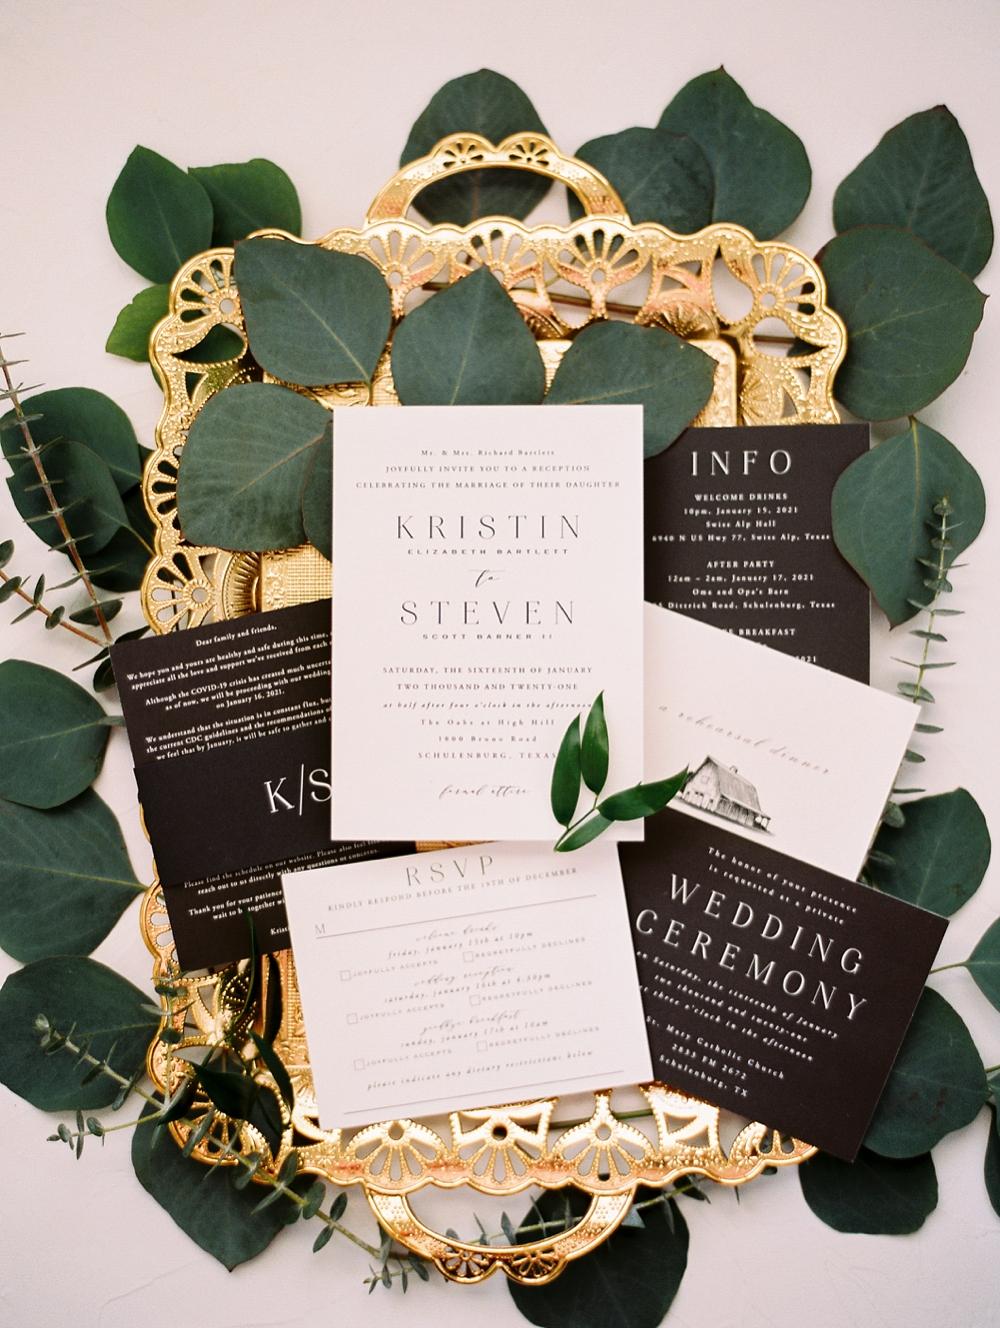 Kristin-La-Voie-Photography-austin-houston-texas-wedding-photographer-the-oaks-at-high-hill -70